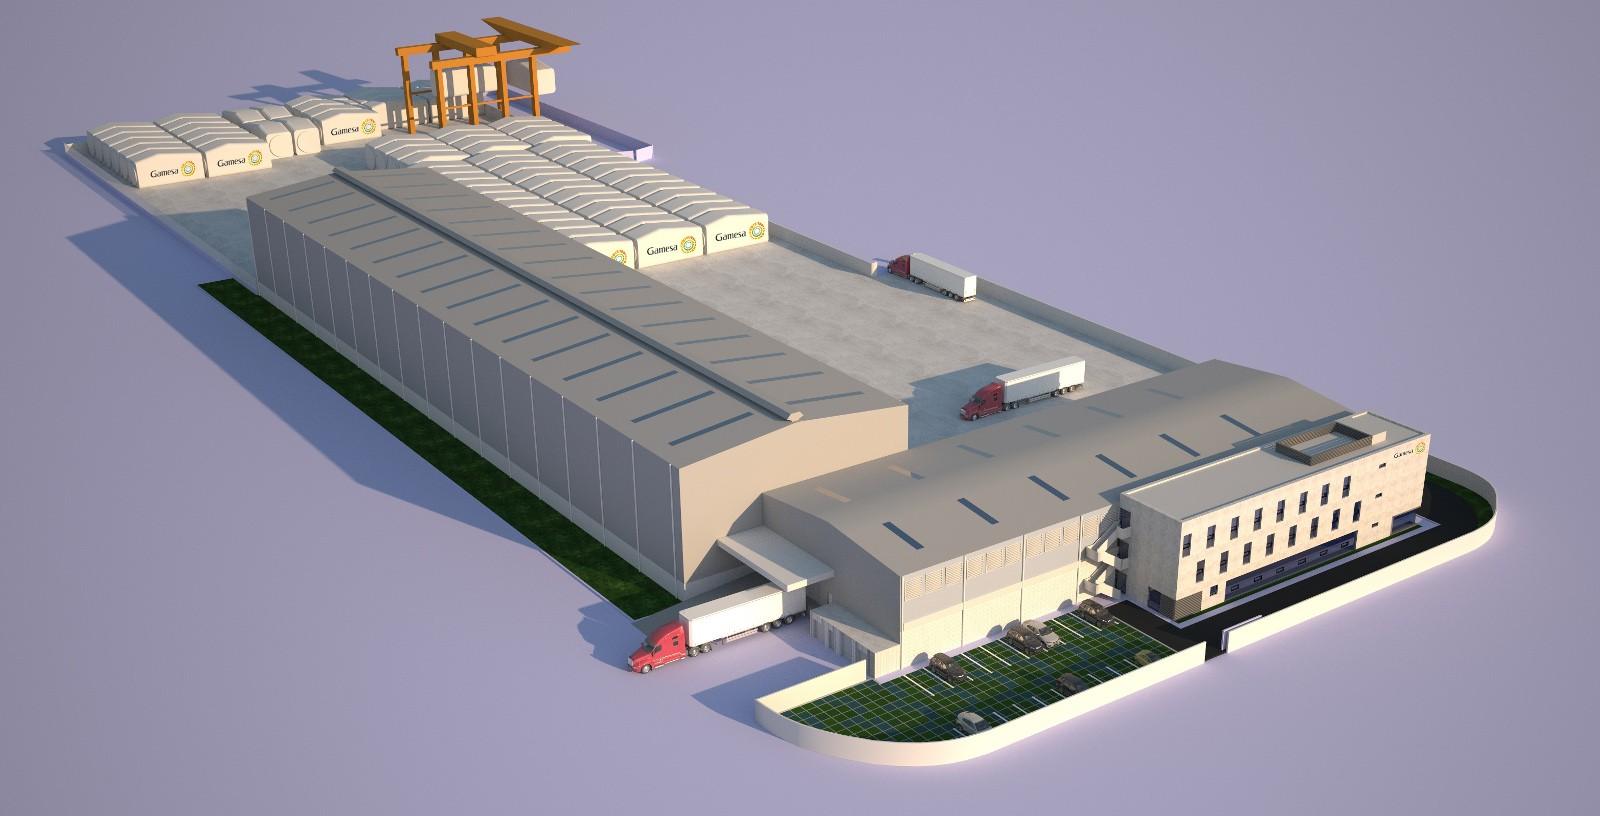 GAMESA_Wind_turbine_manufacturing_plant_Brazil_Idom_1